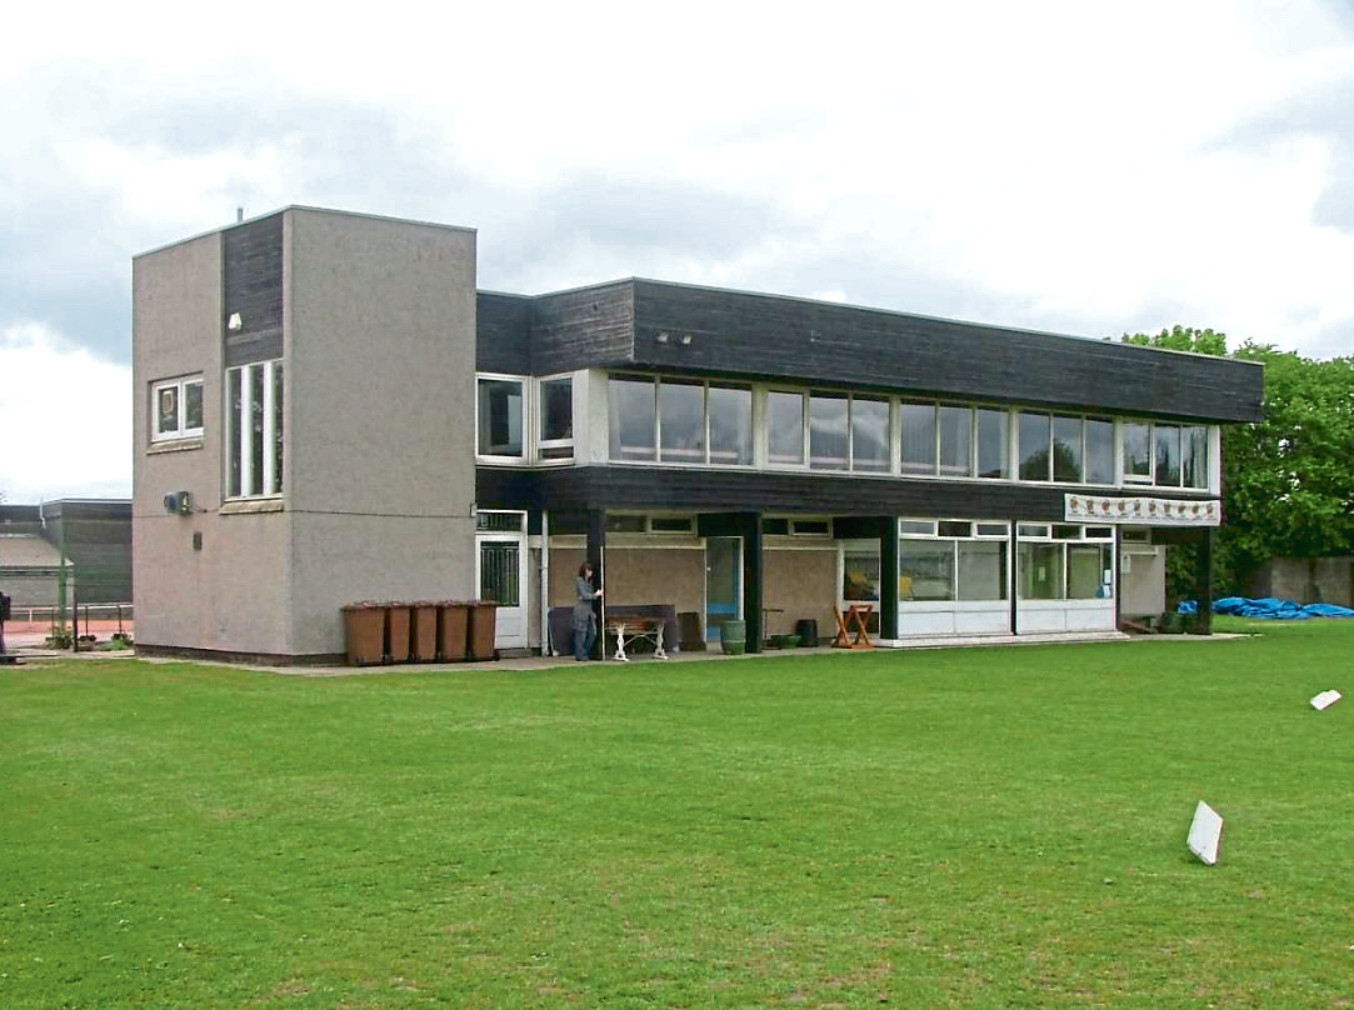 Forthill Sports Club